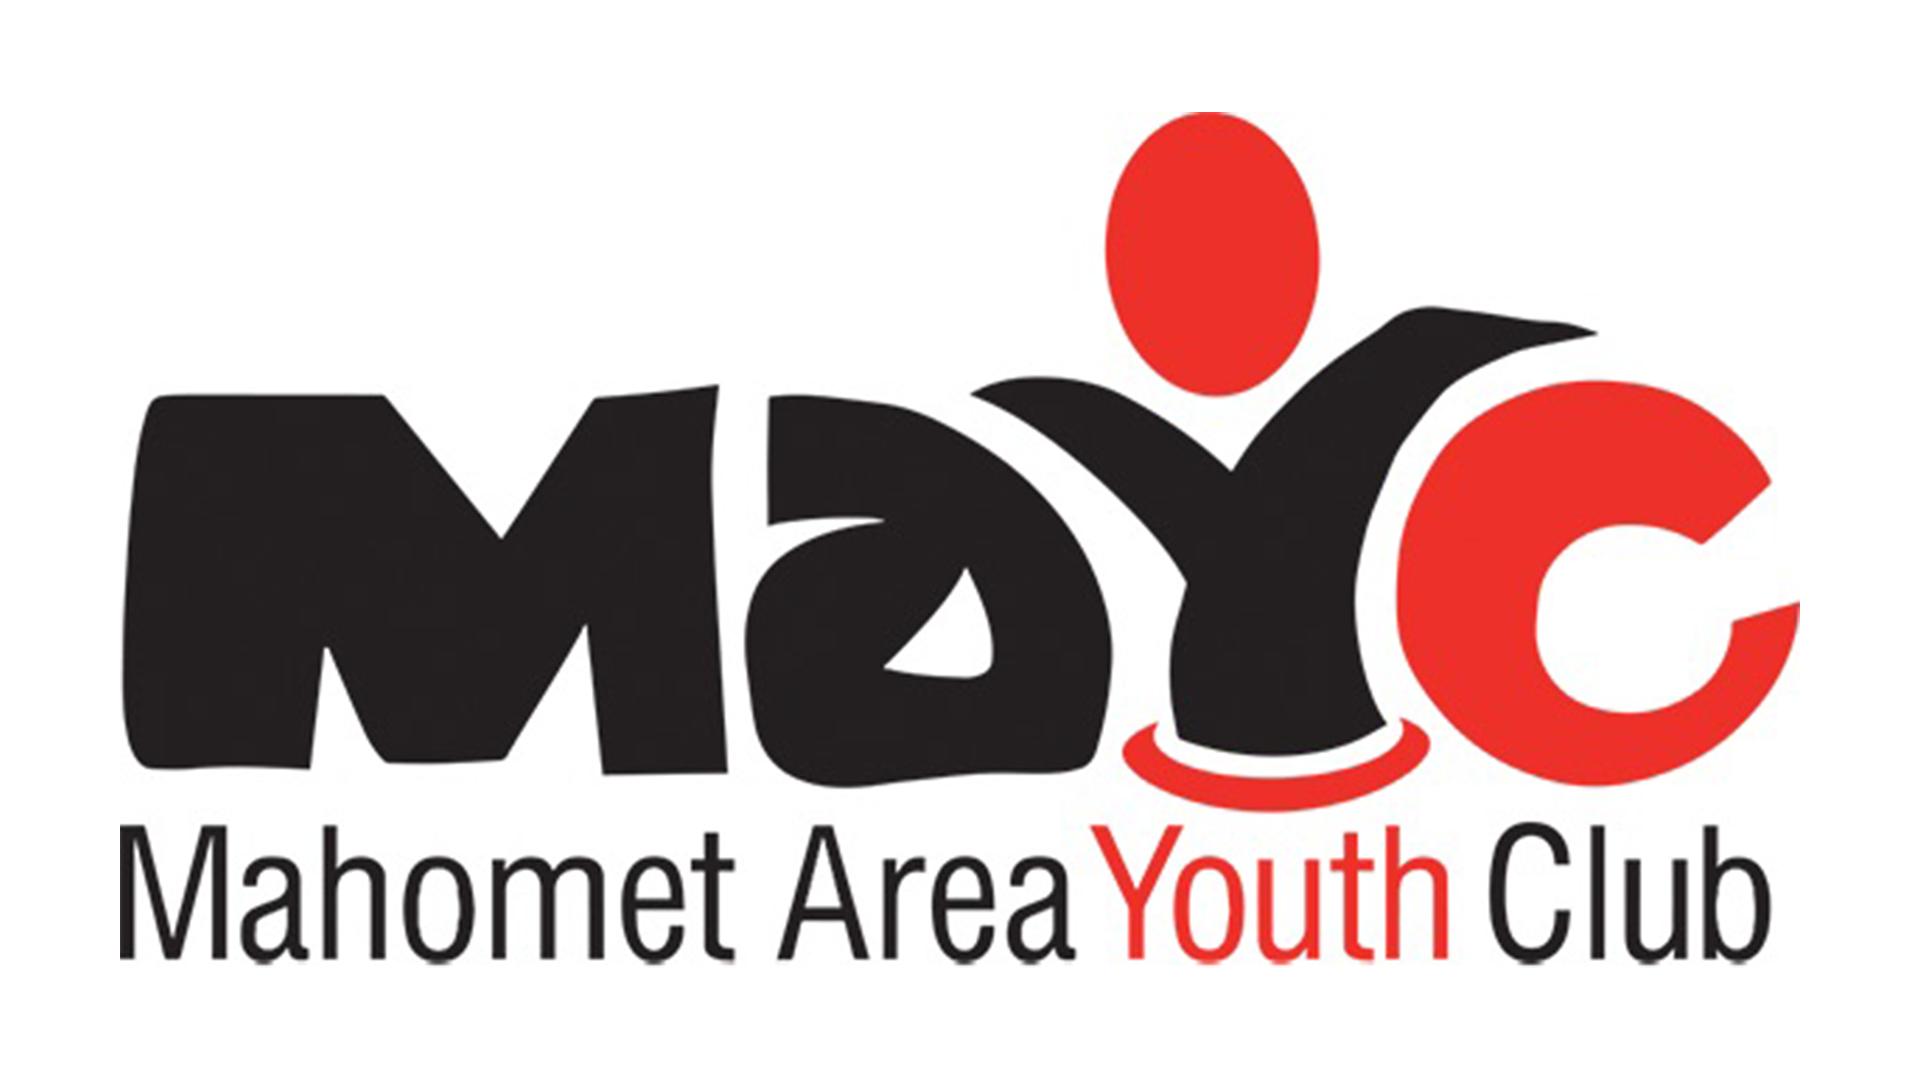 Mahomet Area Youth Club (MAYC)